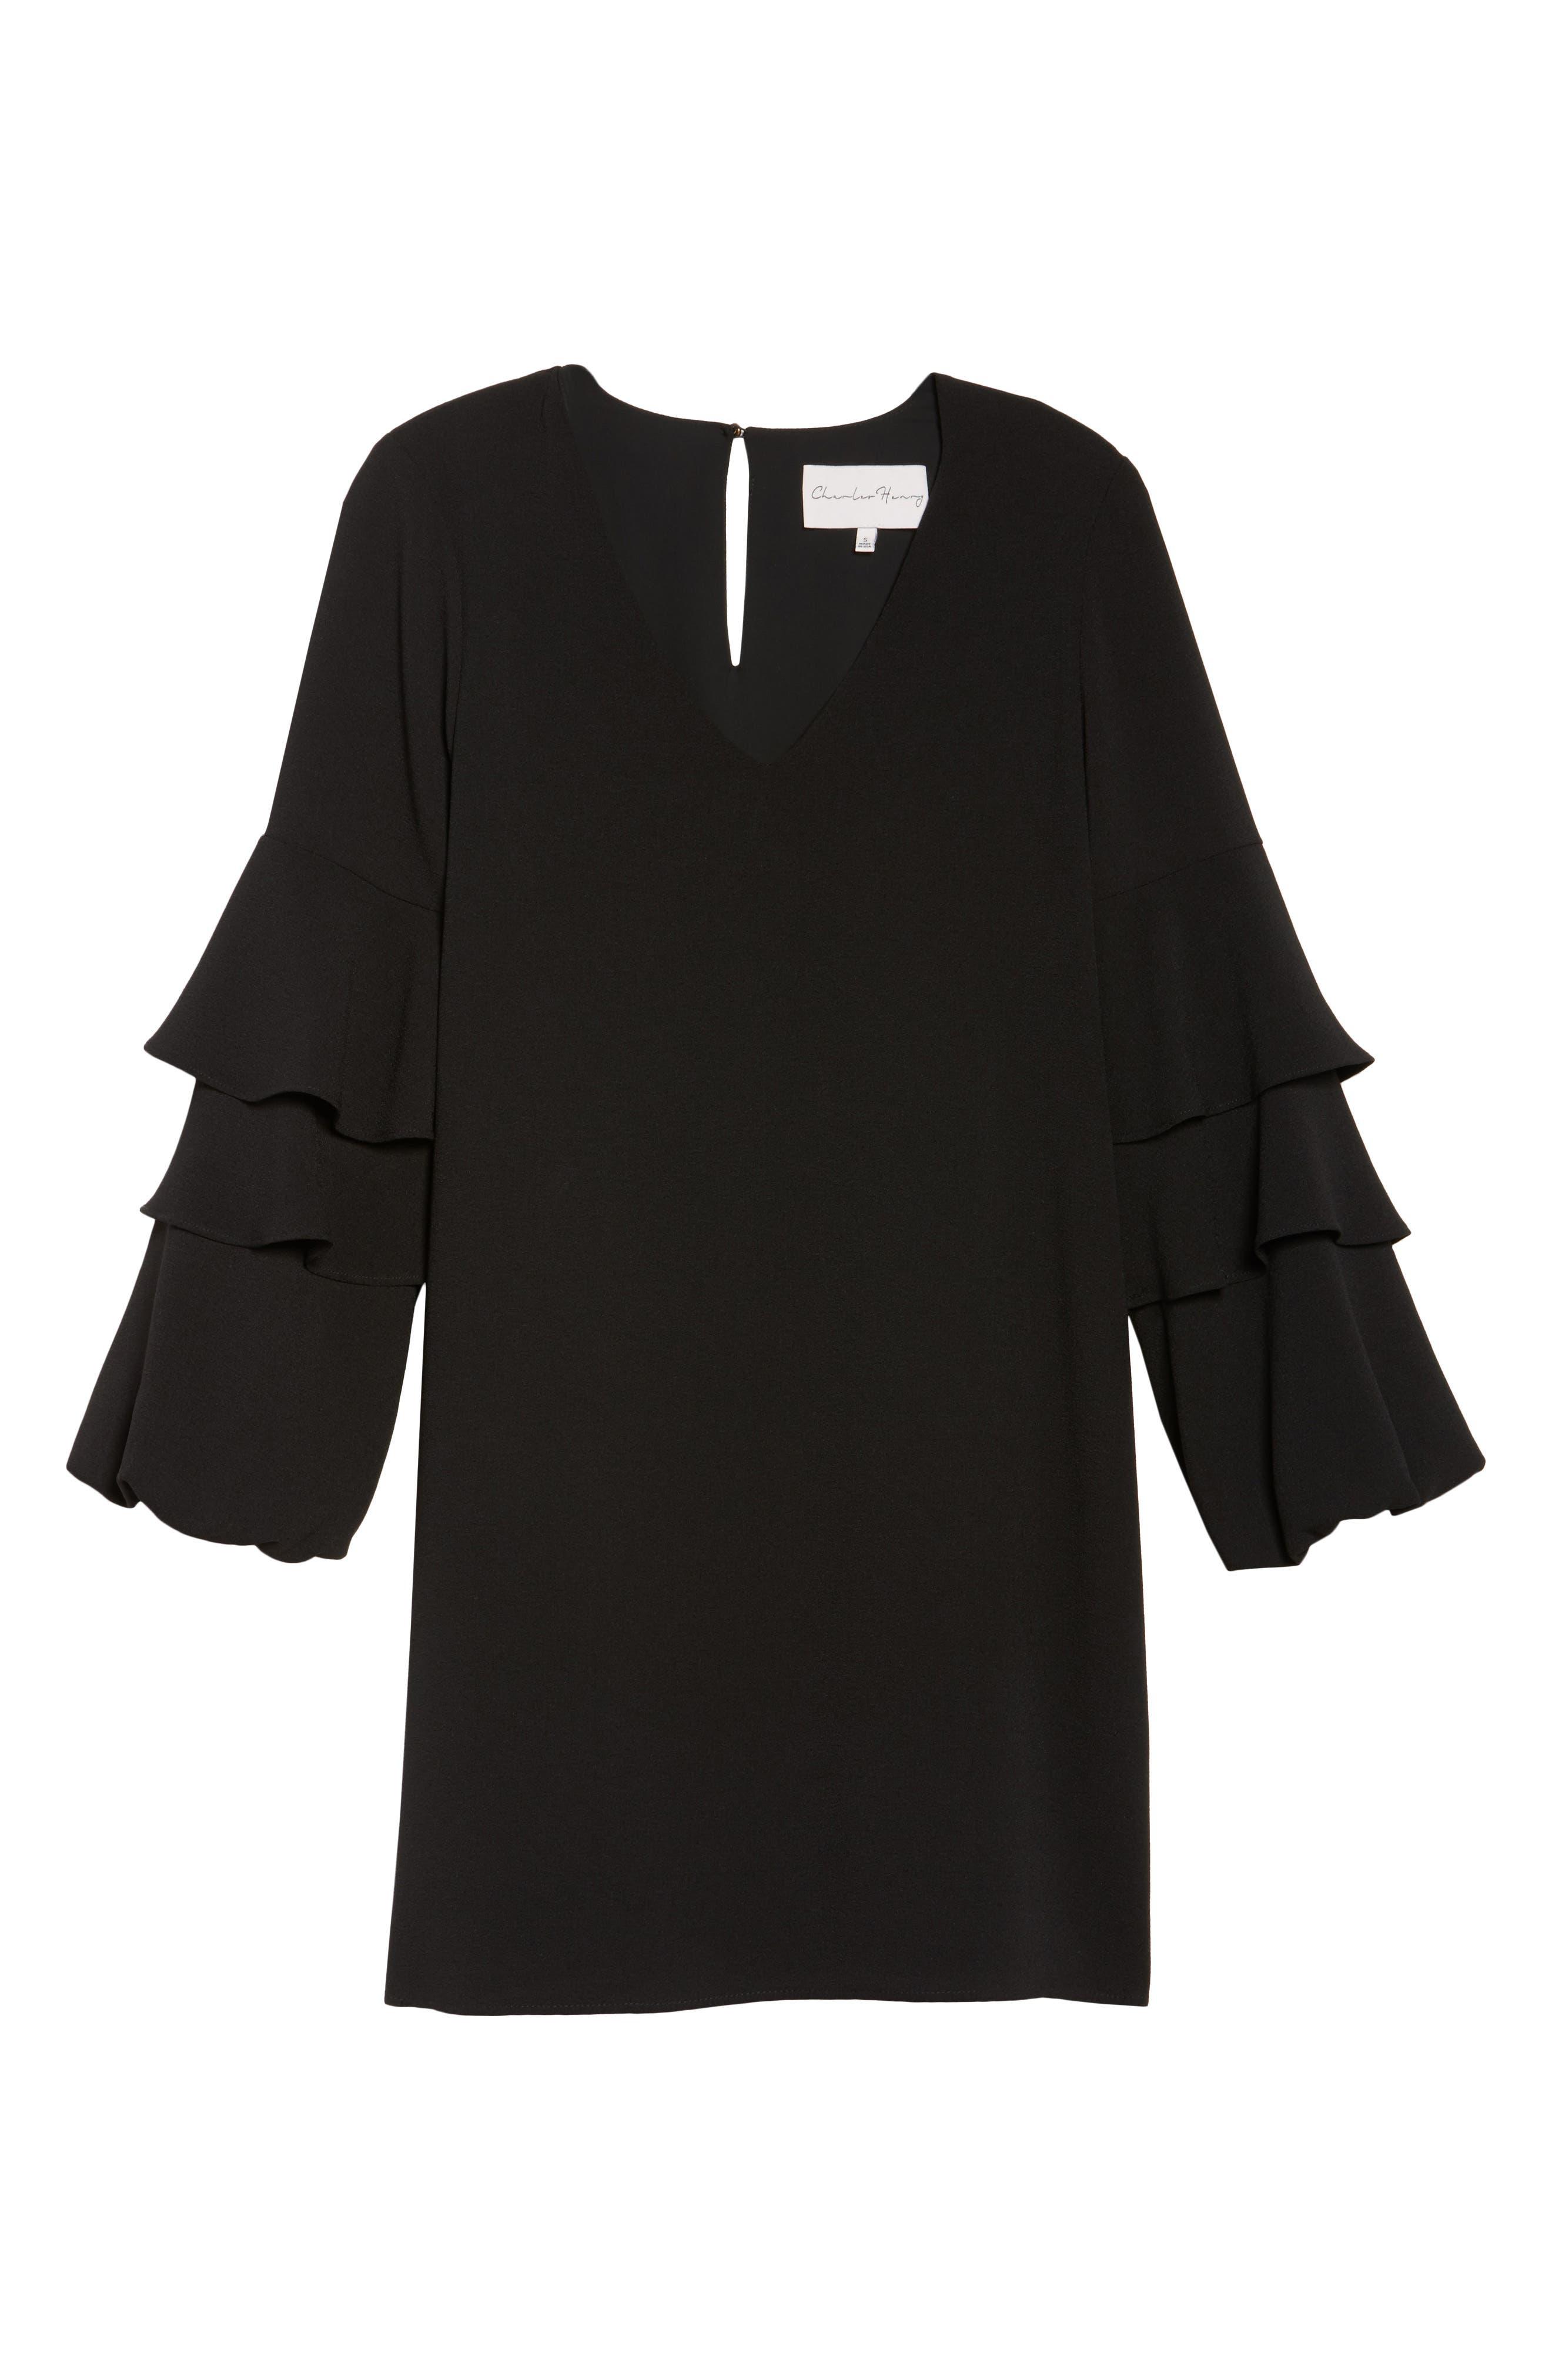 Tiered Ruffle Sleeve Dress,                             Alternate thumbnail 8, color,                             BLACK